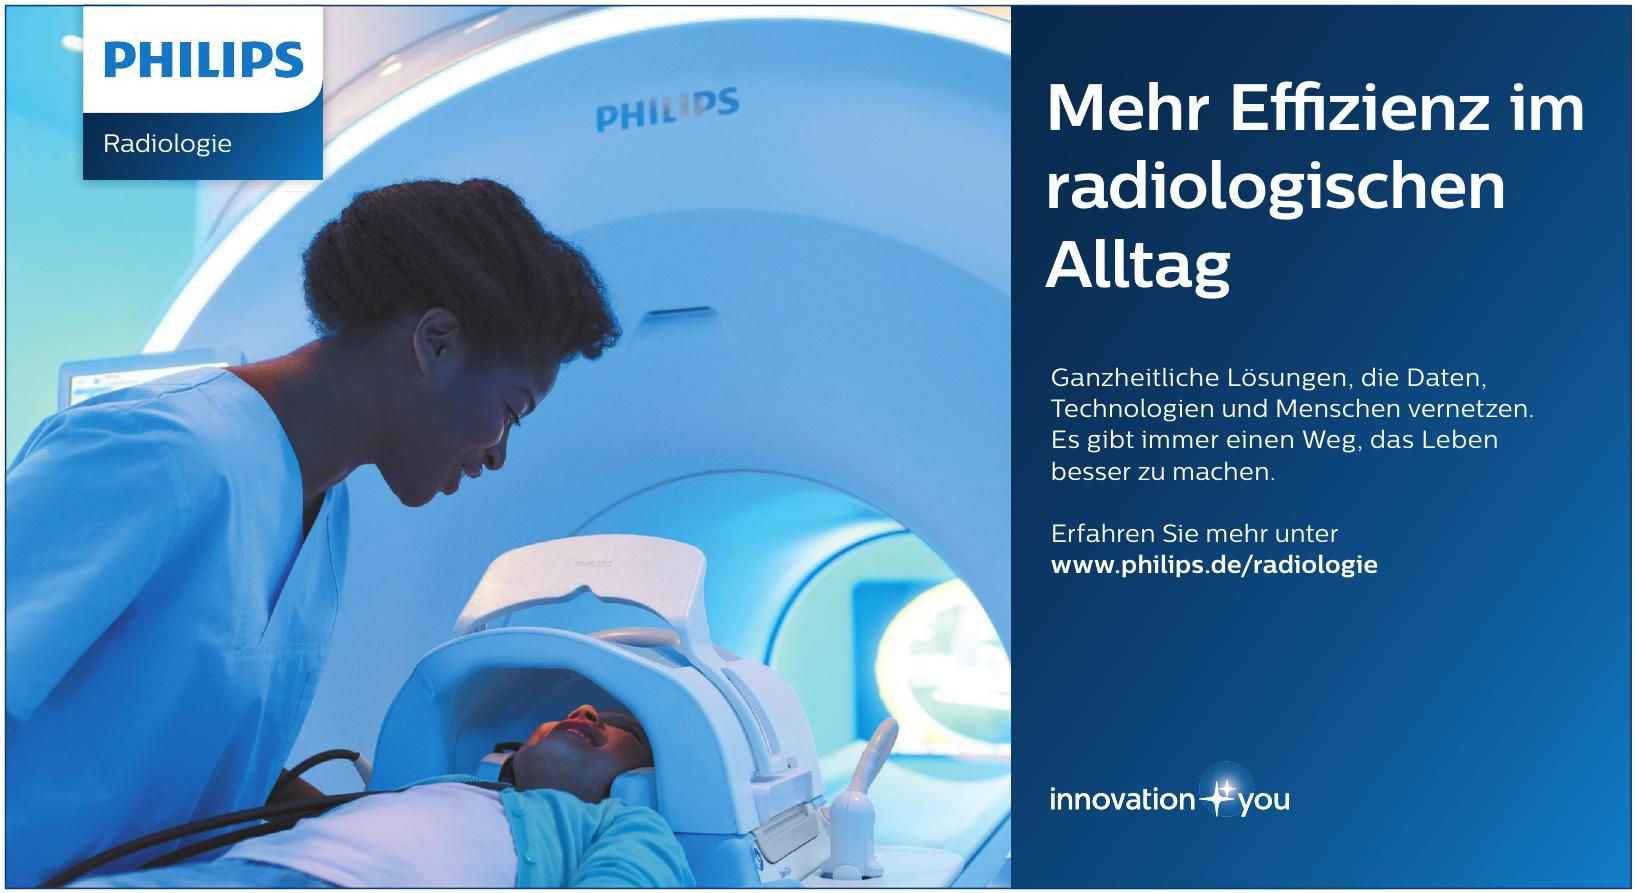 Philips Radiologie